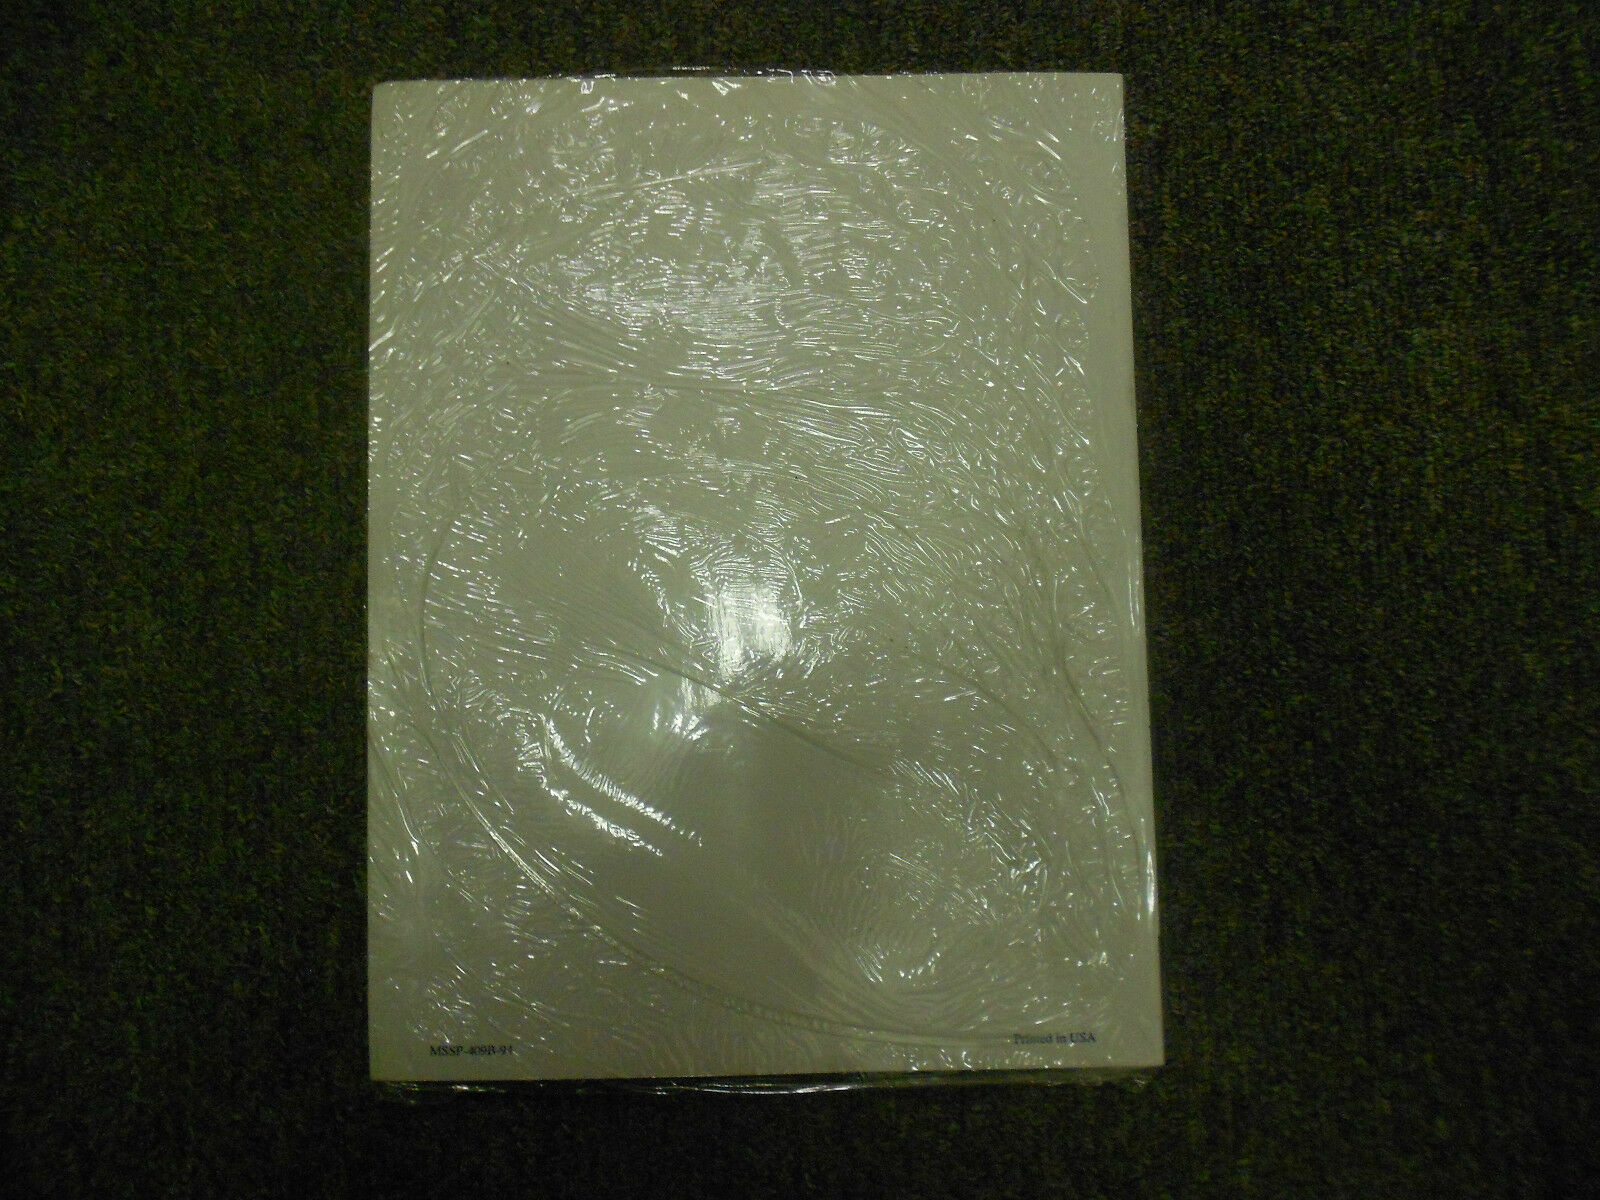 1994 1995 MITSUBISHI Galant Body Repair Shop Manual FACTORY FEO BOOK 94 95 DEAL